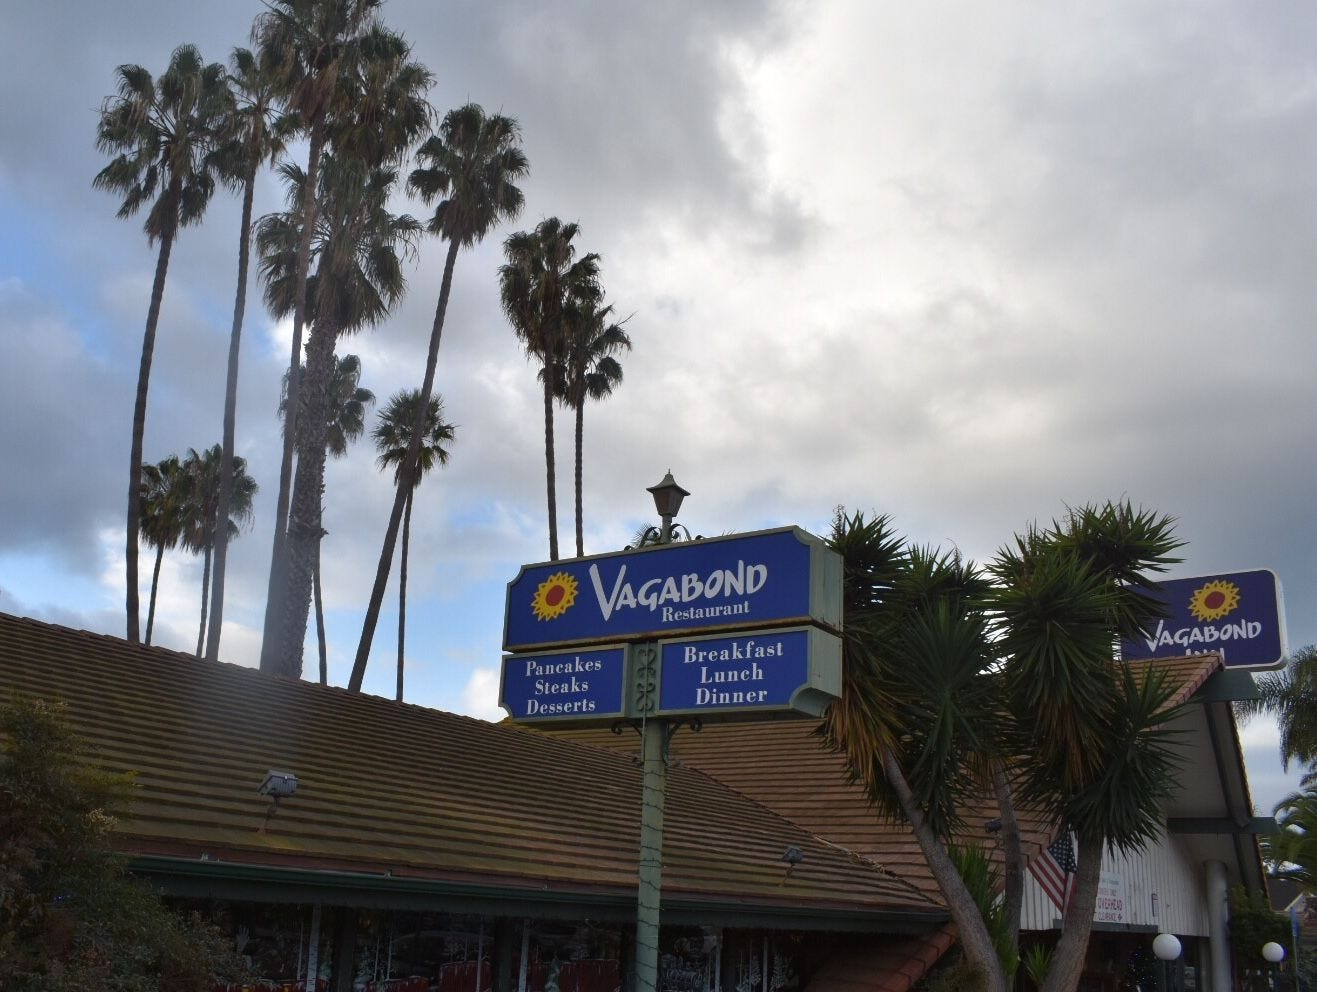 After 52 years, the Ventura Vagabond Restaurant closed Jan. 1.  https://bit.ly/2QglGG5